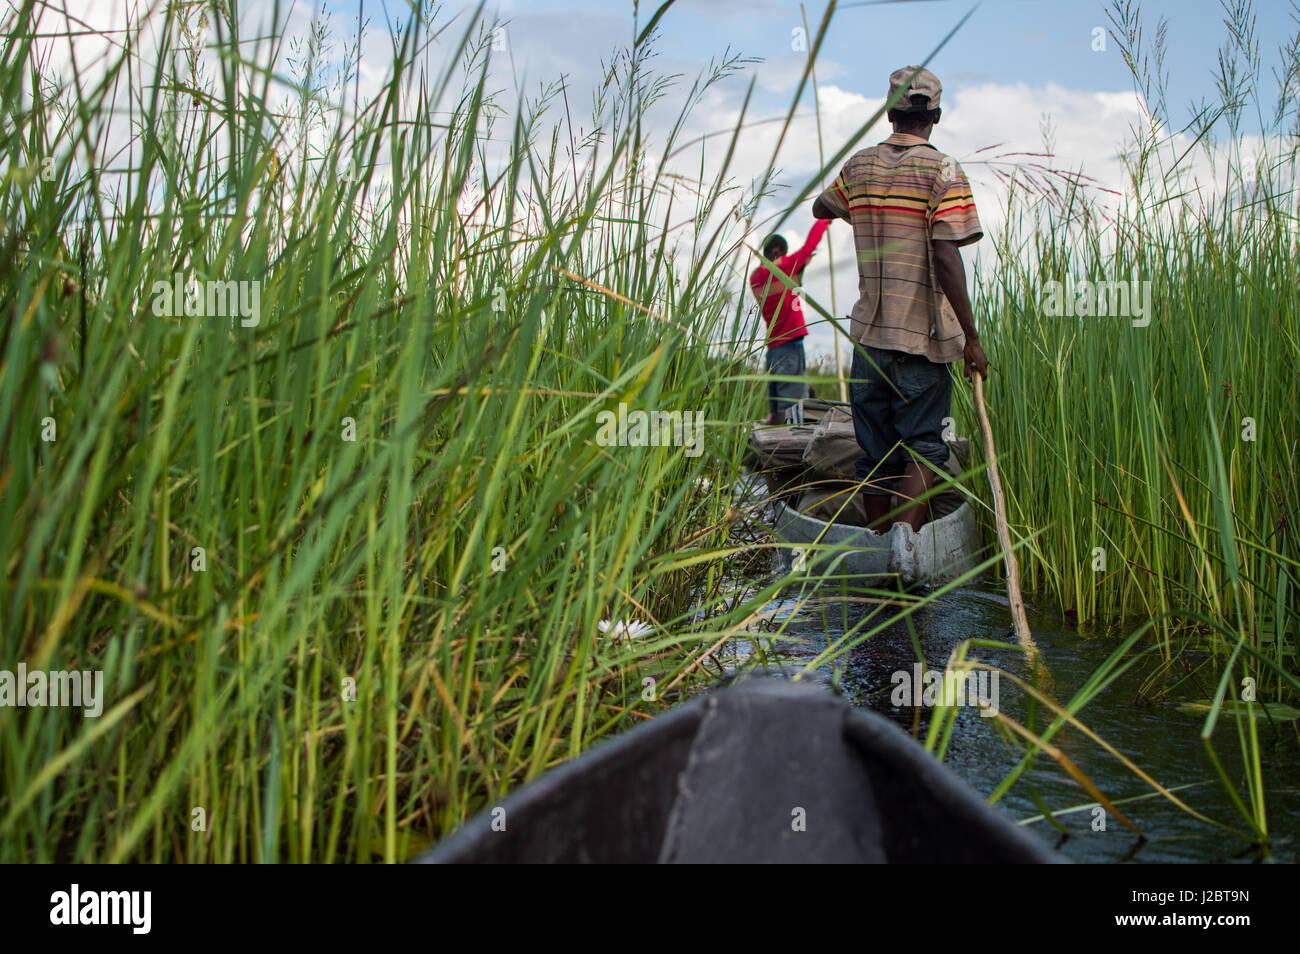 Mokoro Canoe Trip in the Okavango Delta near Maun, Botswana - Stock Image